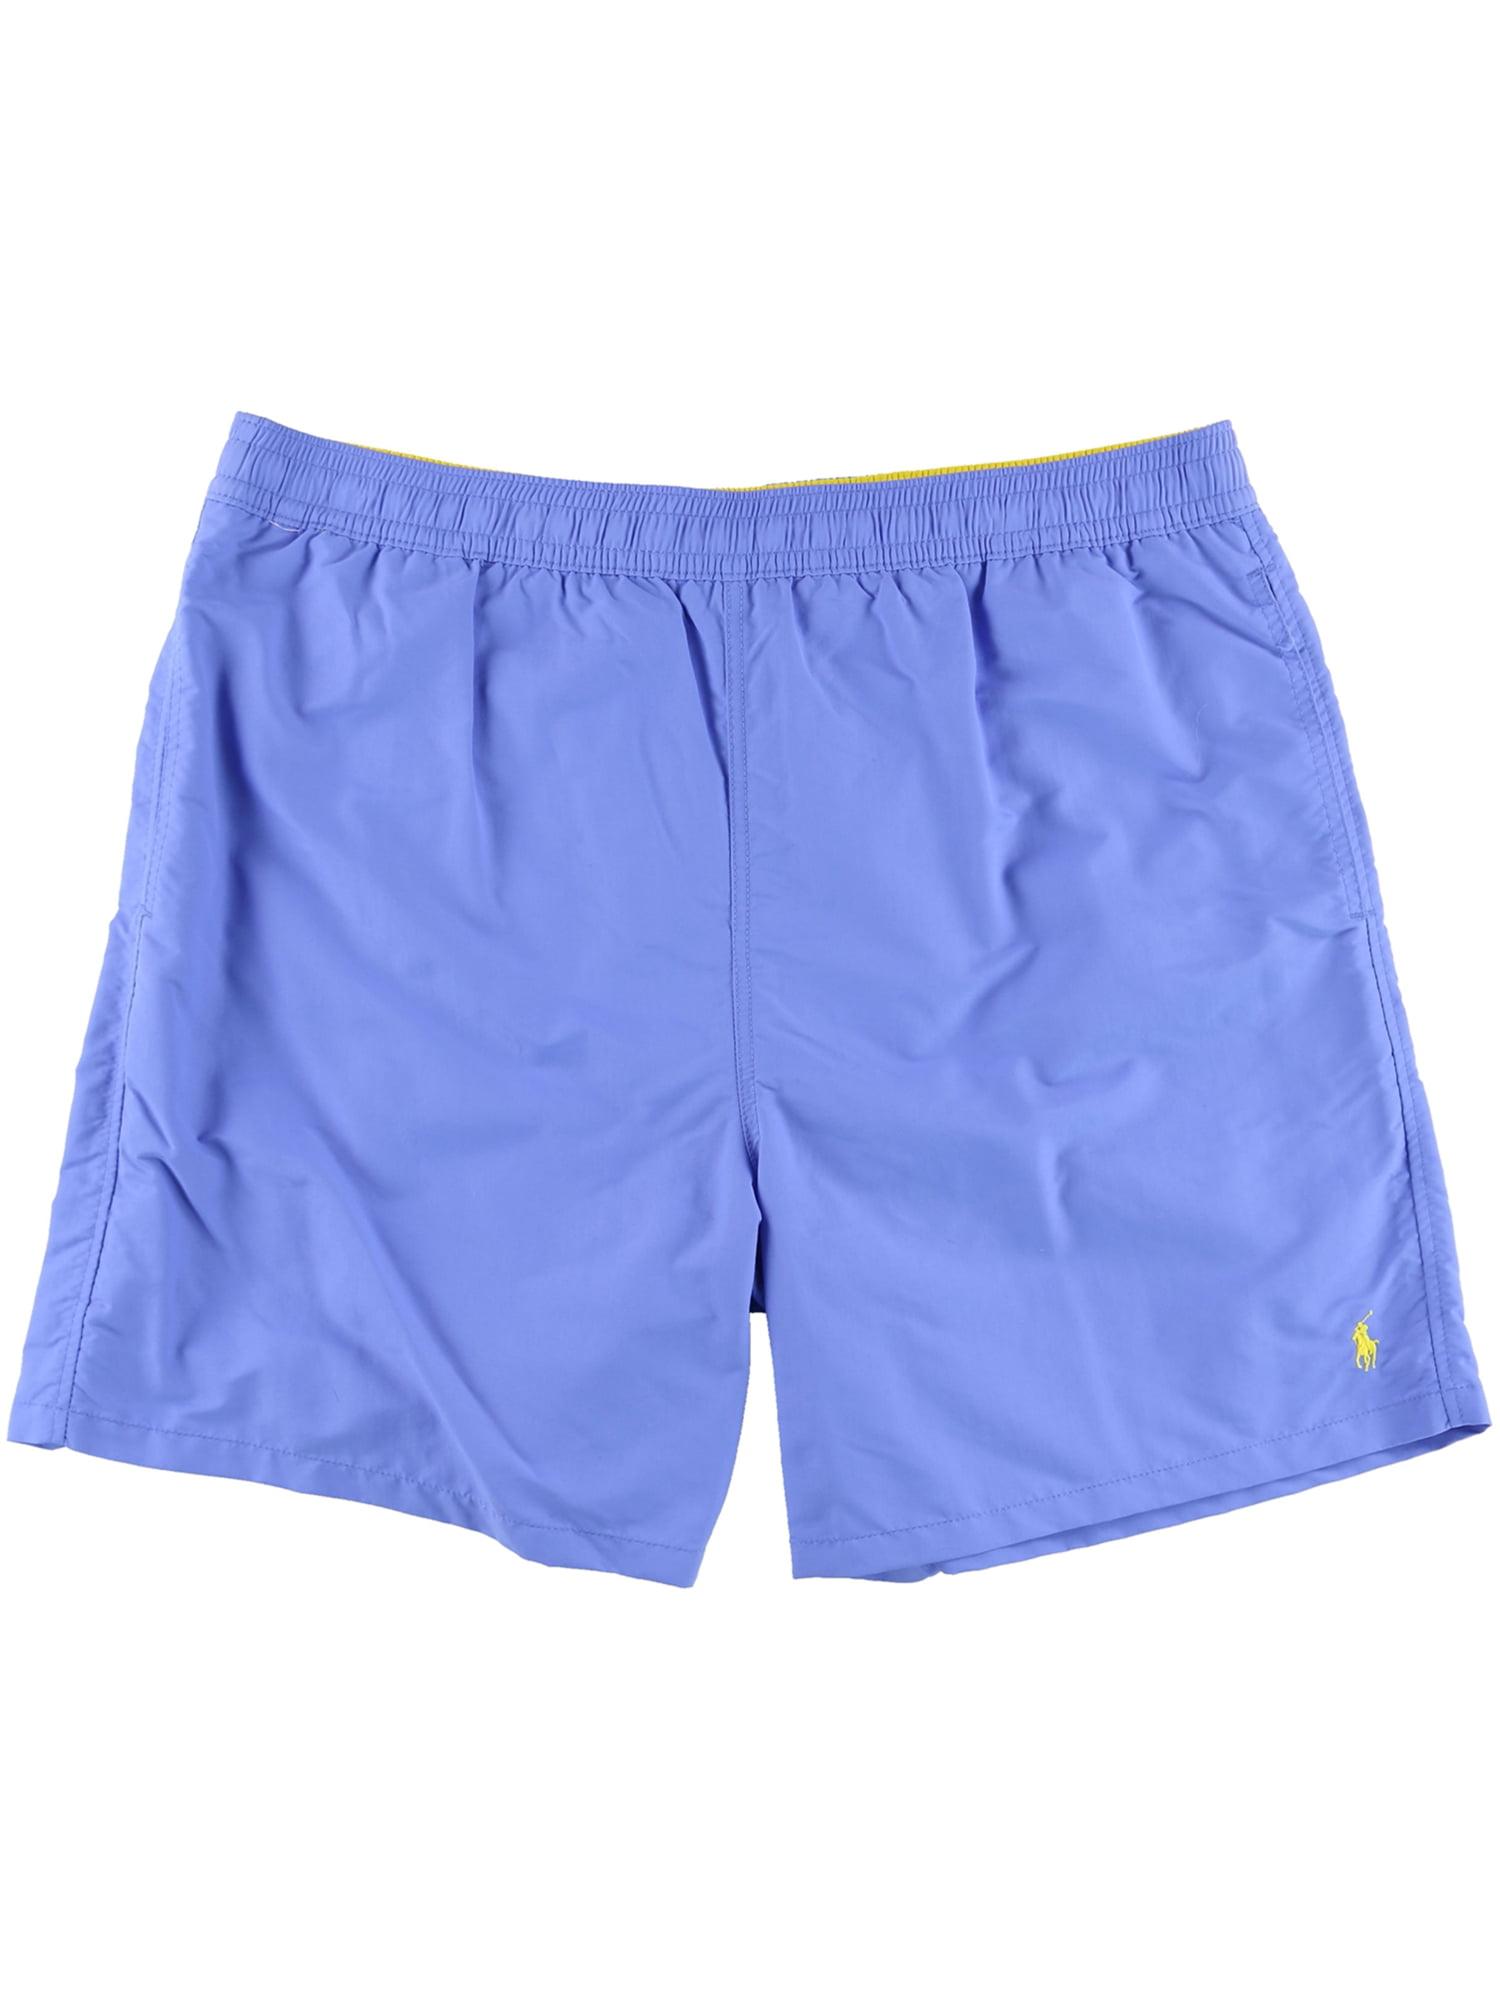 dbd3326b0a Men's Swimwear | Walmart Canada